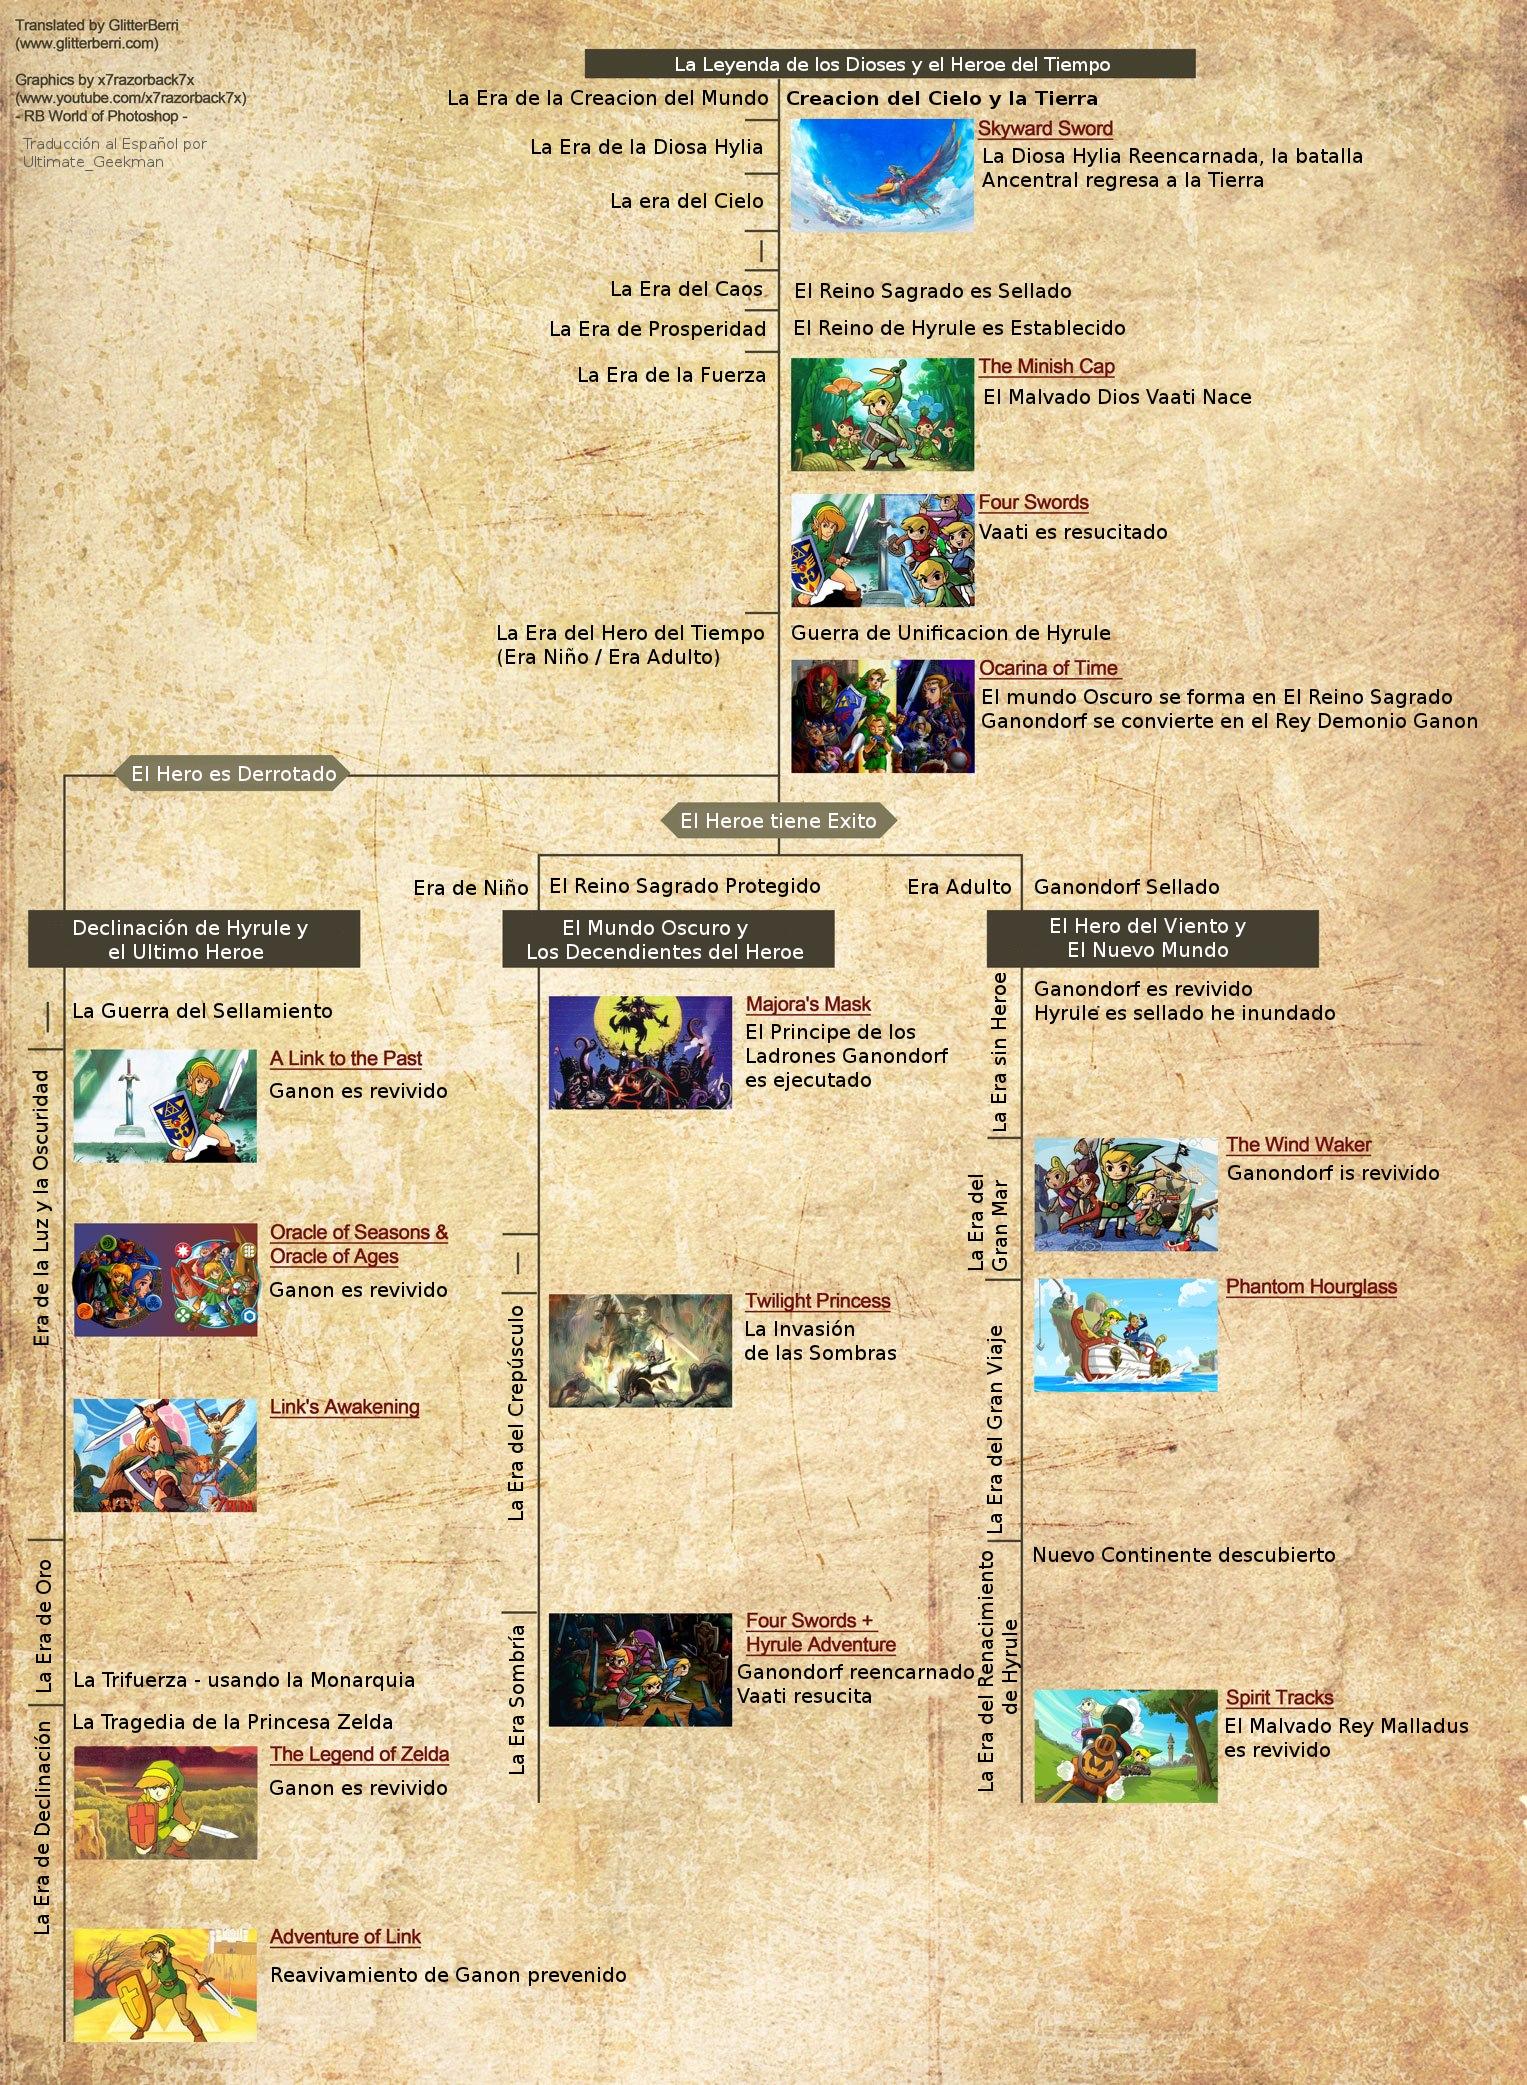 Imagen Cronologia Oficial The Leyend Of Zelda Espanol Jpg The